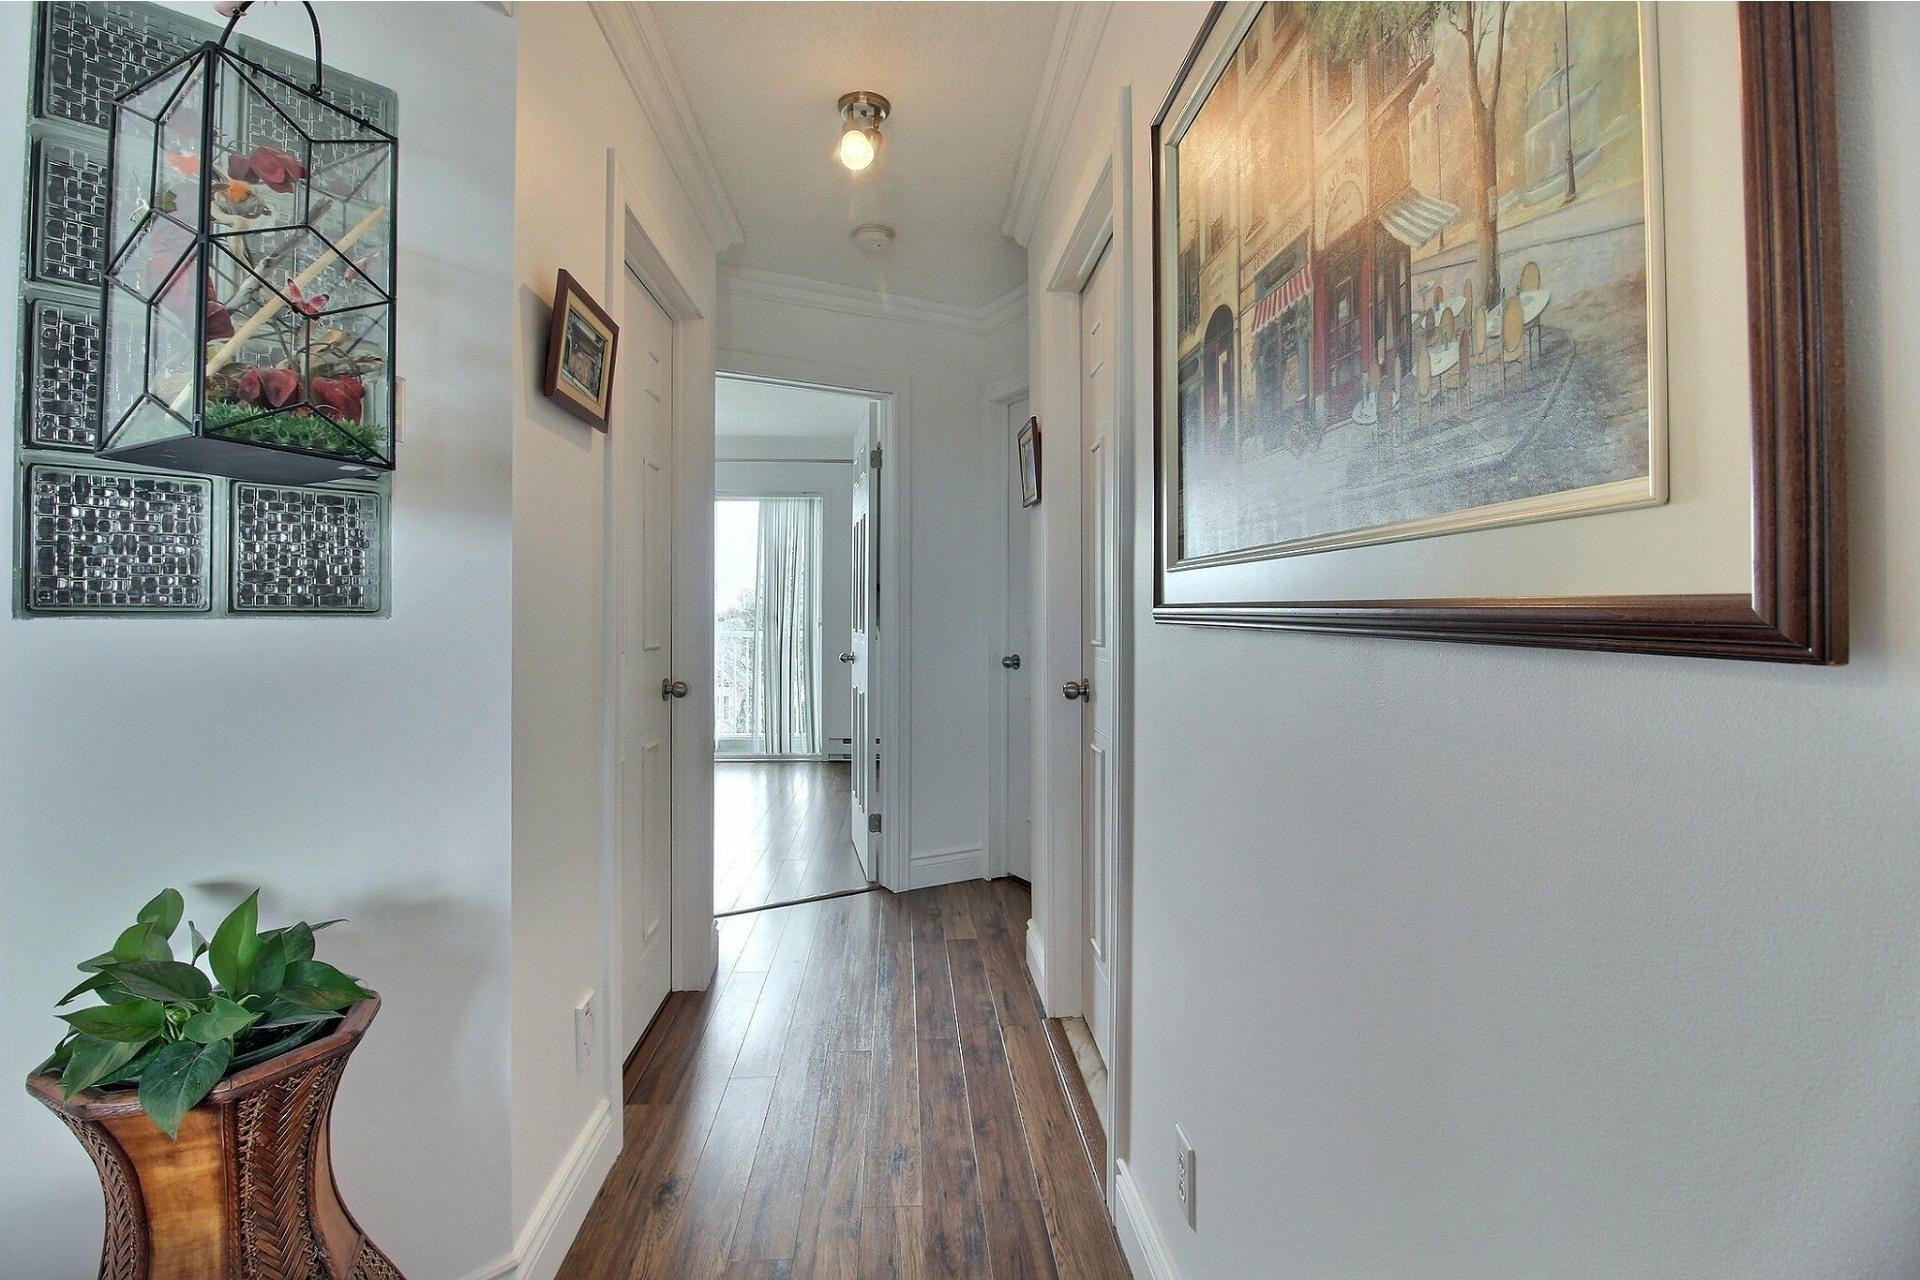 image 9 - Appartement À vendre Repentigny Repentigny  - 7 pièces